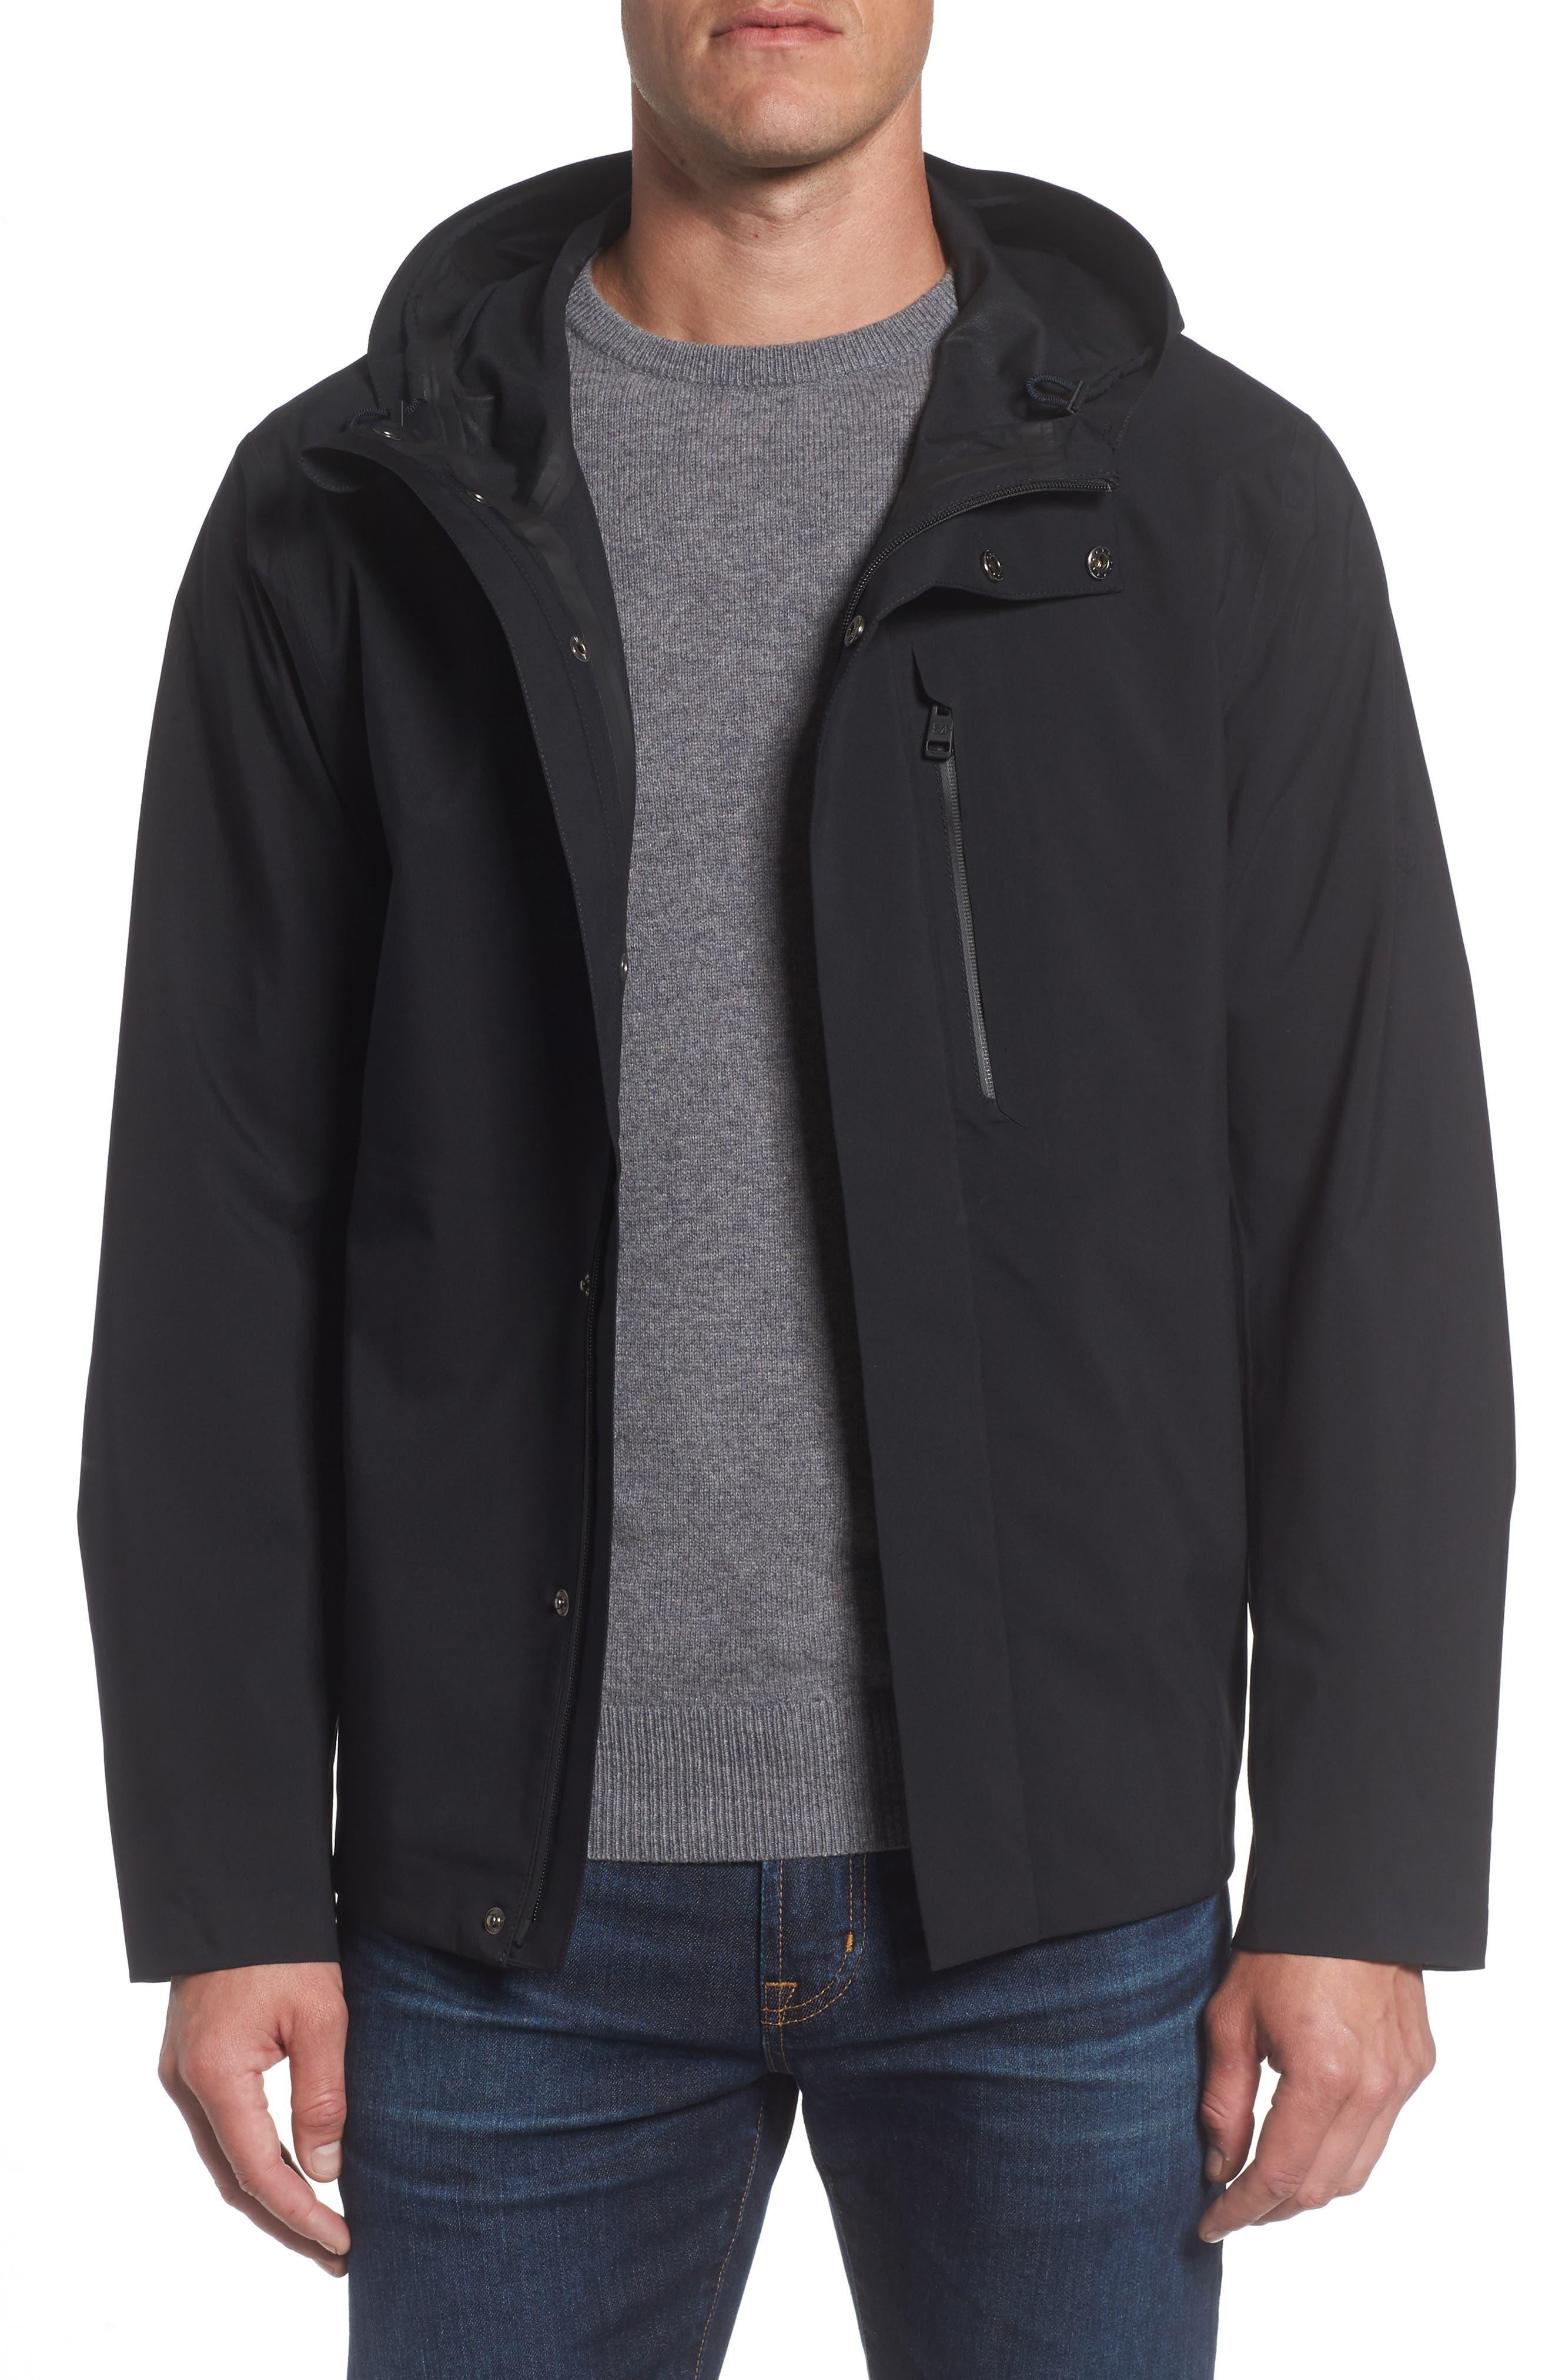 Marc New York Stratus Waterproof Hooded Rain Jacket,                         Main,                         color, 001